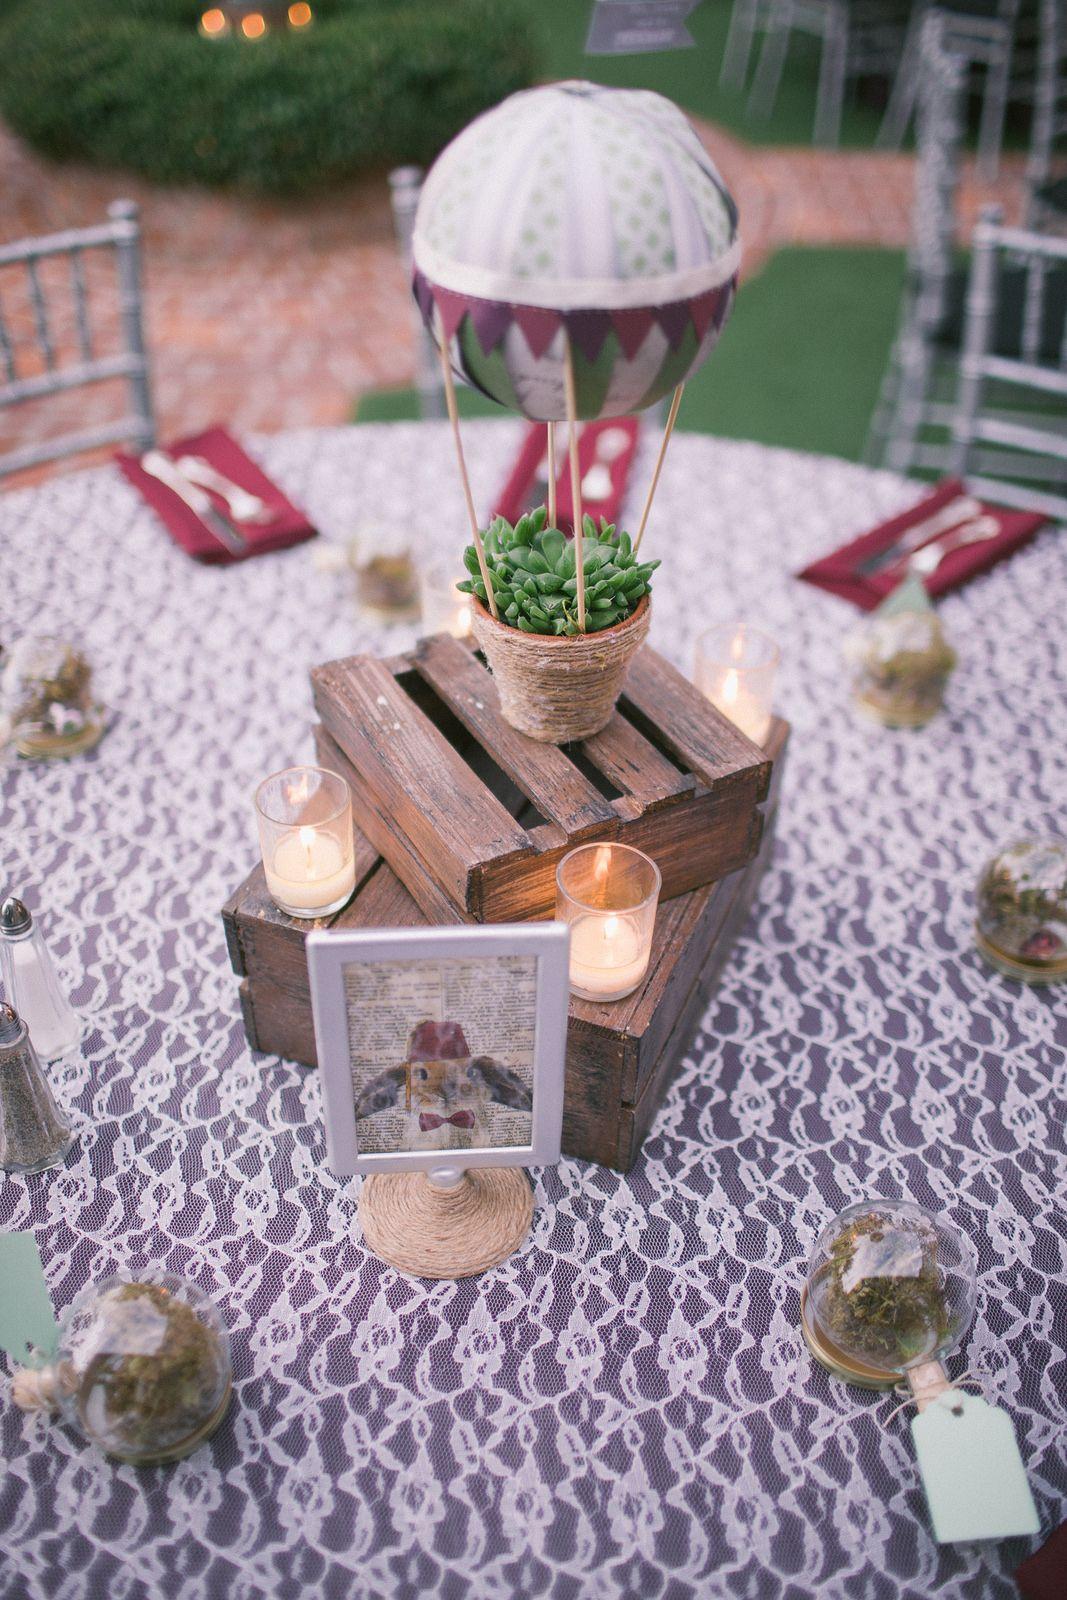 Vintage style wedding decoration ideas  Karina u Taylorus vintage style music and zombies wedding  Zombie